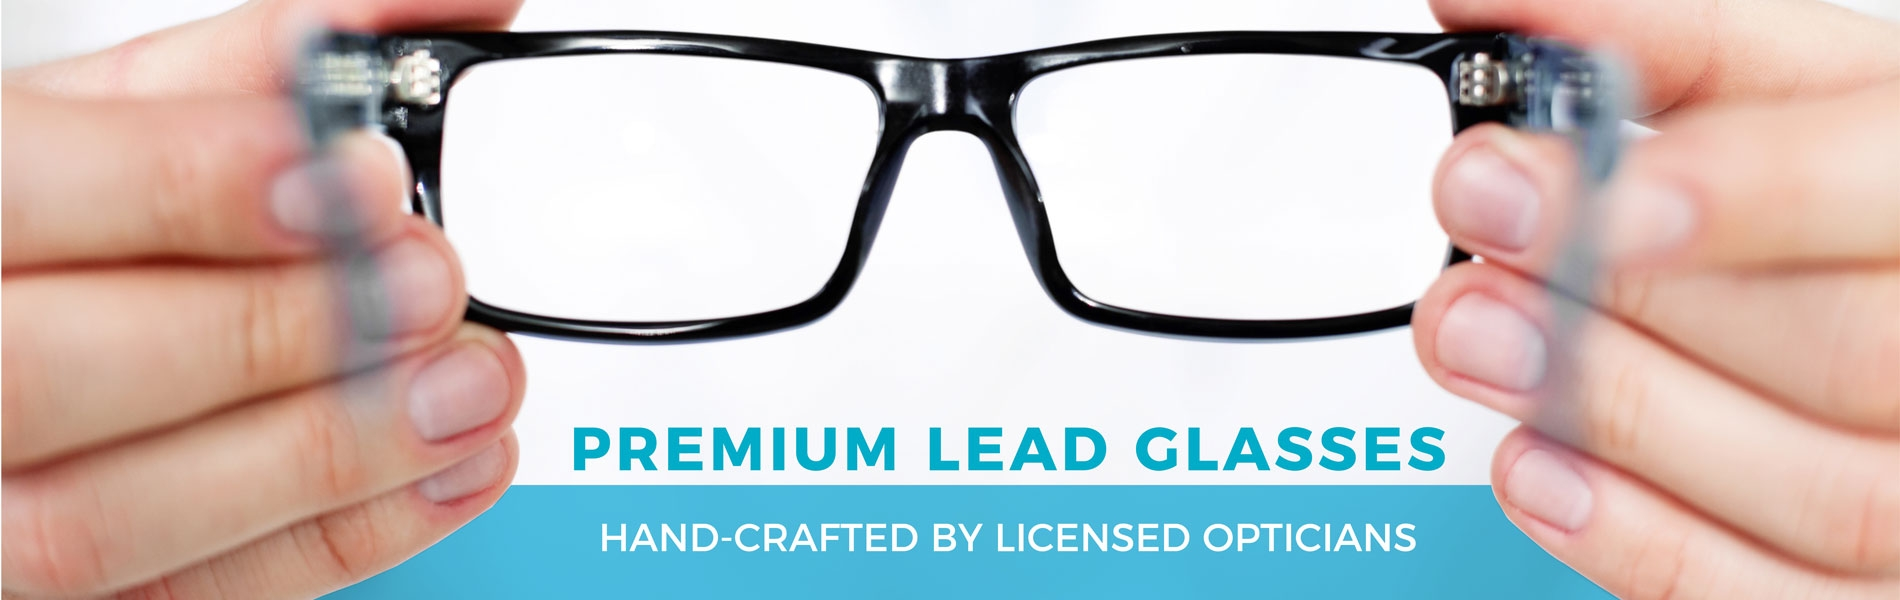 Home_Protech-Leaded-Eyewear-ed-1900x600.jpg